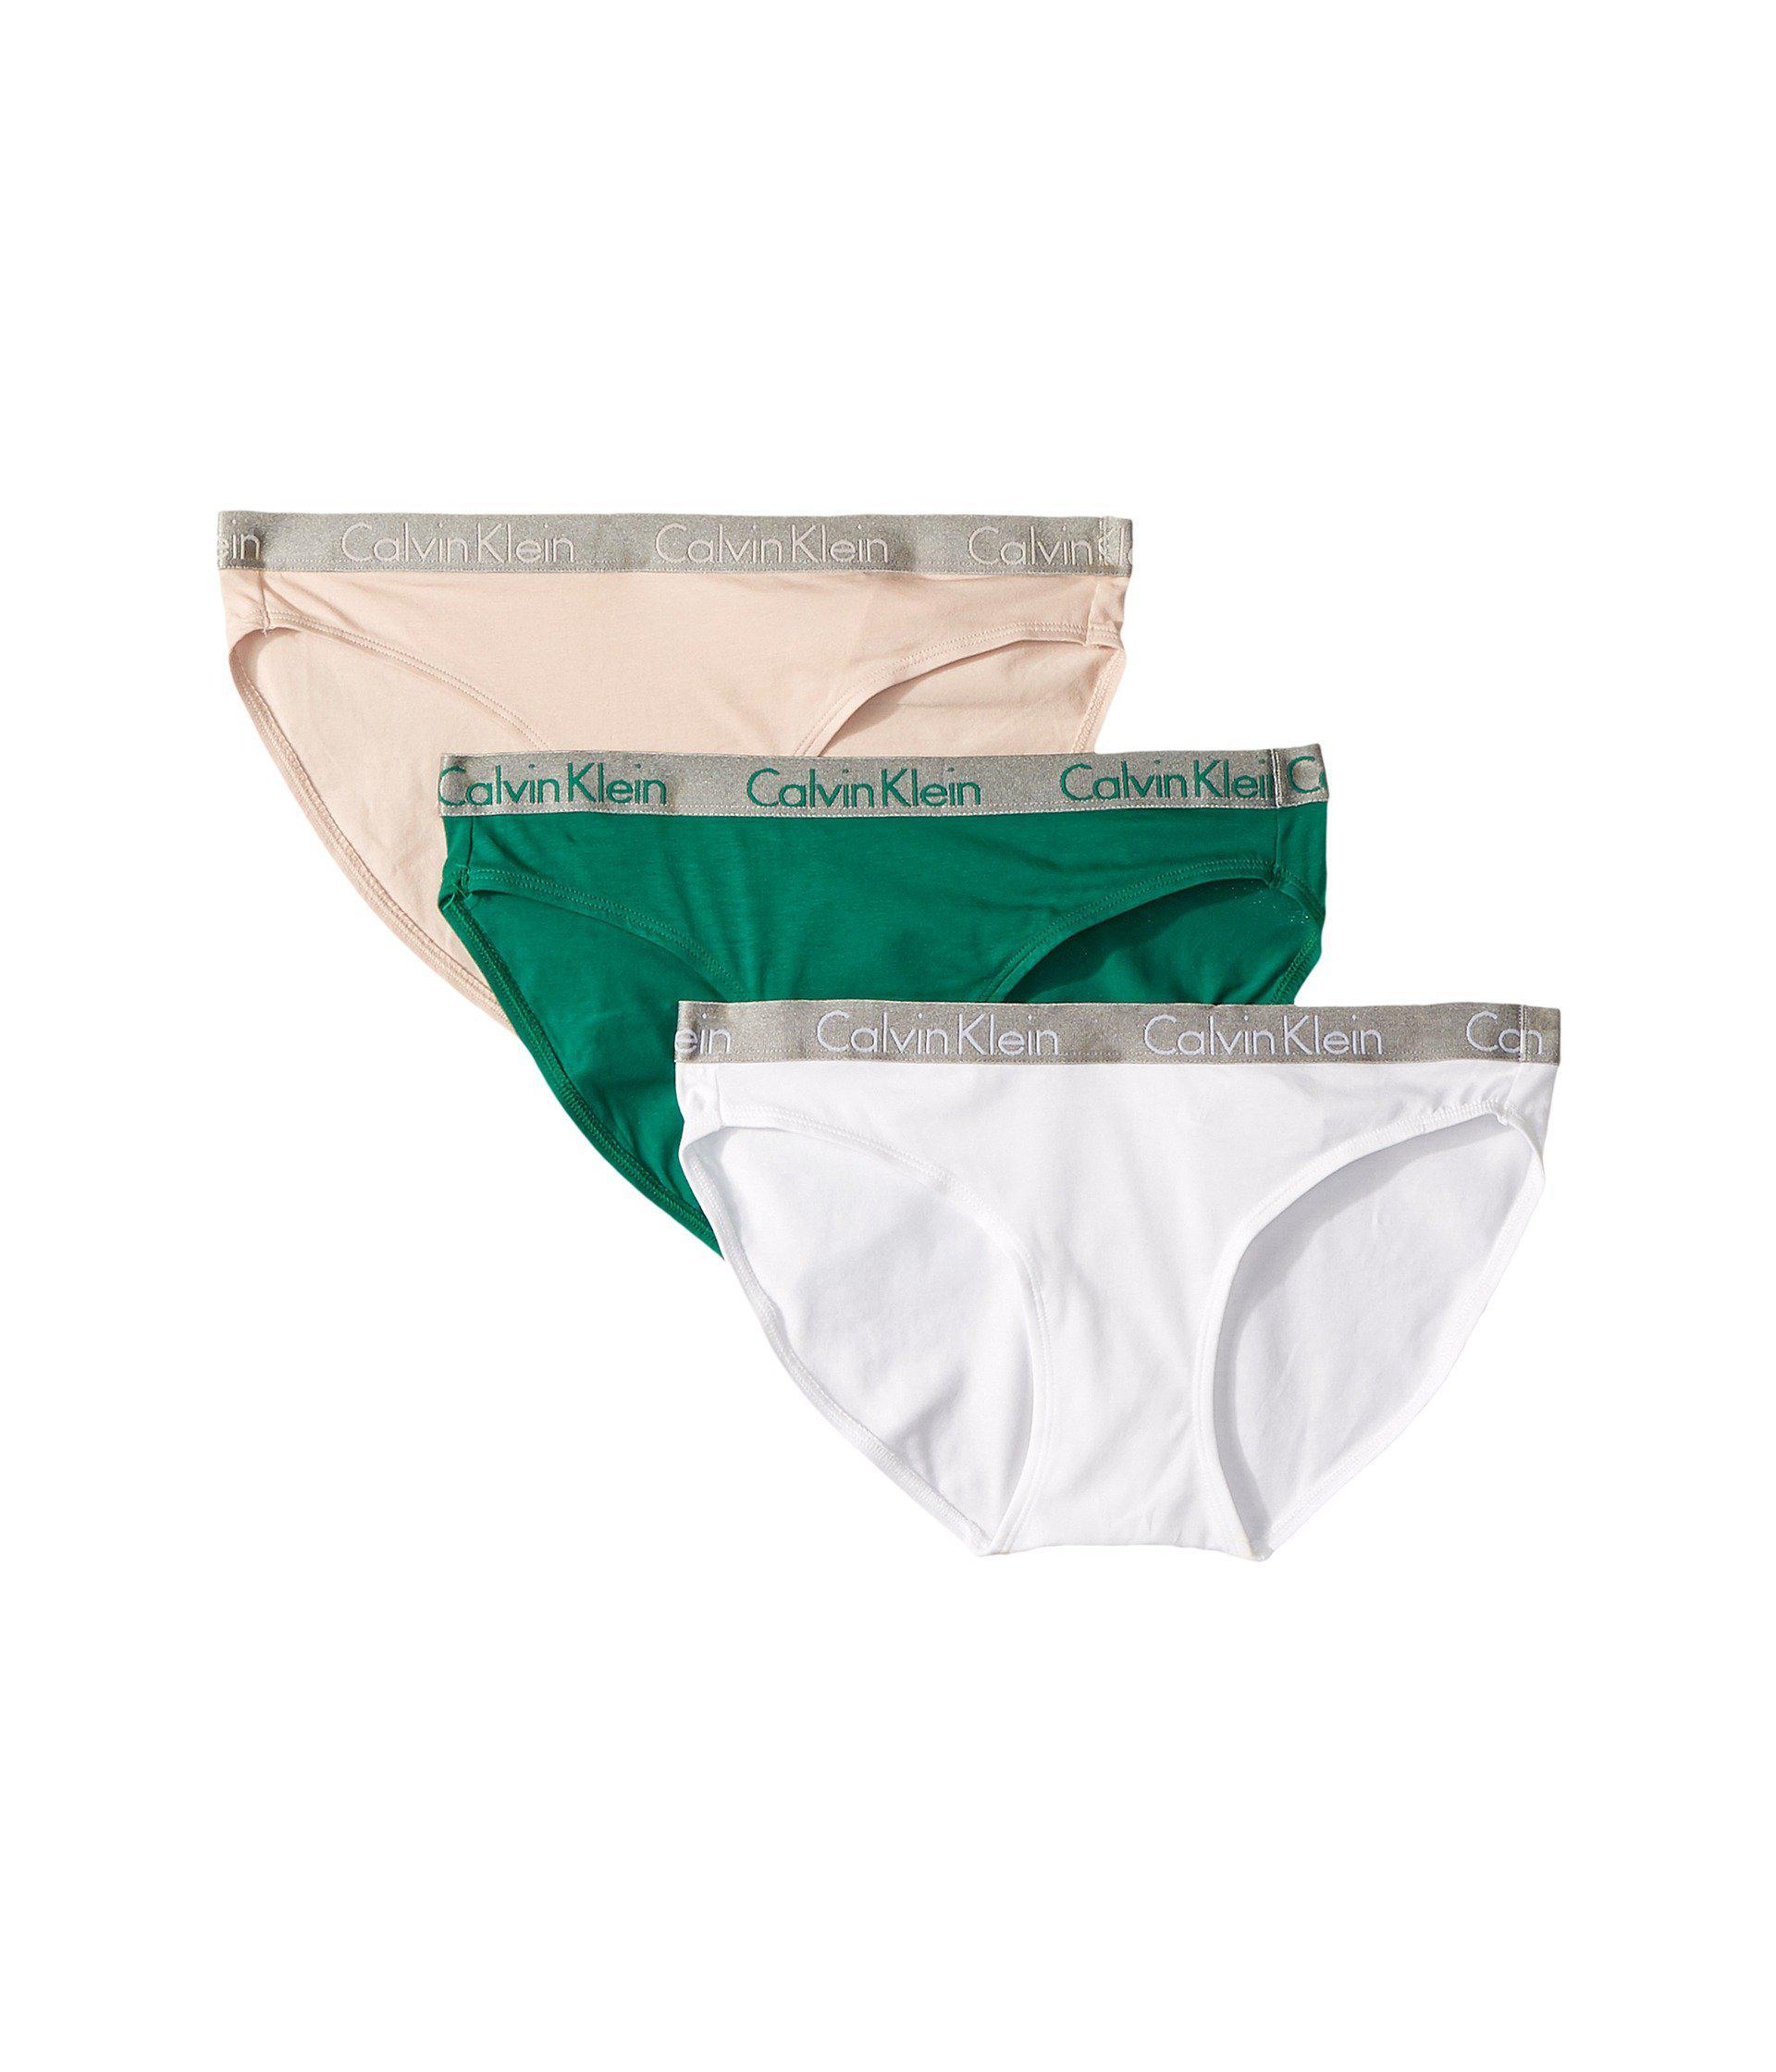 cace7c9a3 Lyst - Calvin Klein Radiant Cotton 3-pack Bikini (unity ashford Grey ...